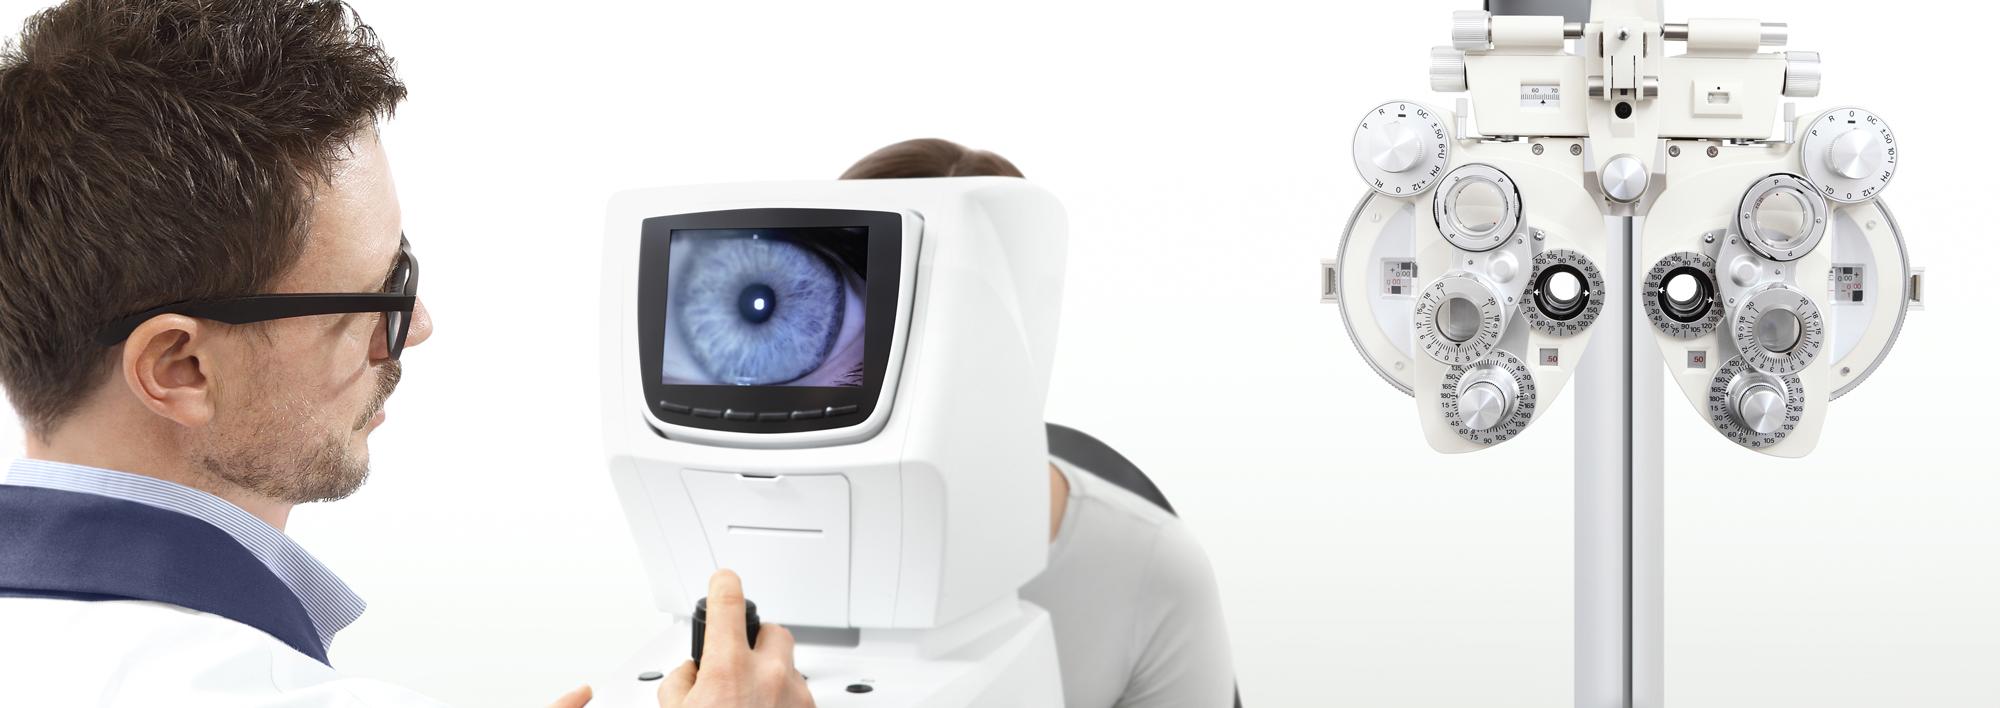 Optometrist ophthalmic lane exam